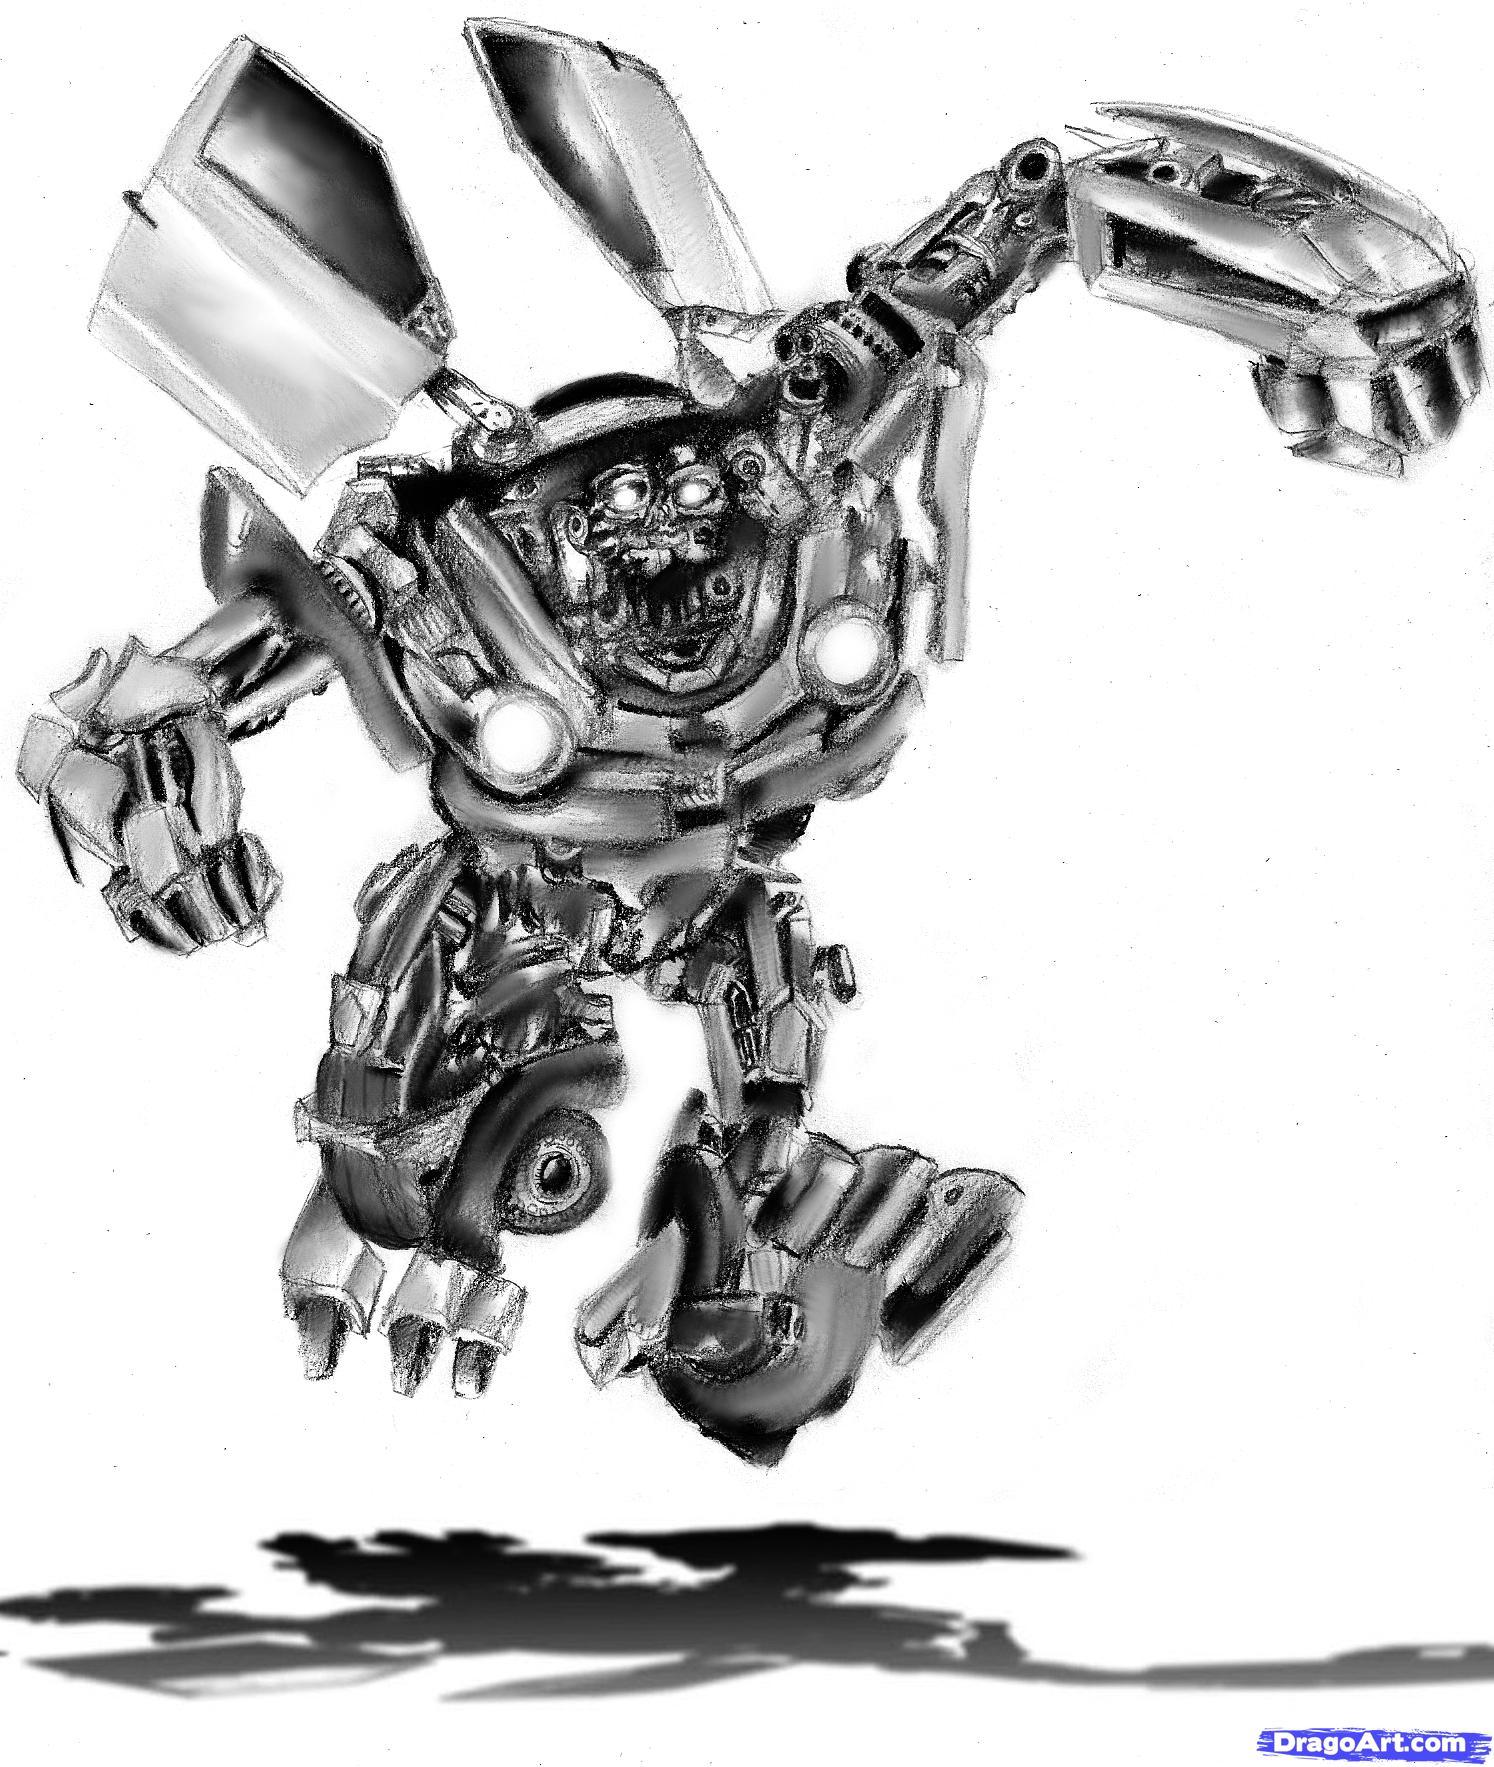 Drawn transformers Drawing Transformers Characters Transformers transformers from How draw